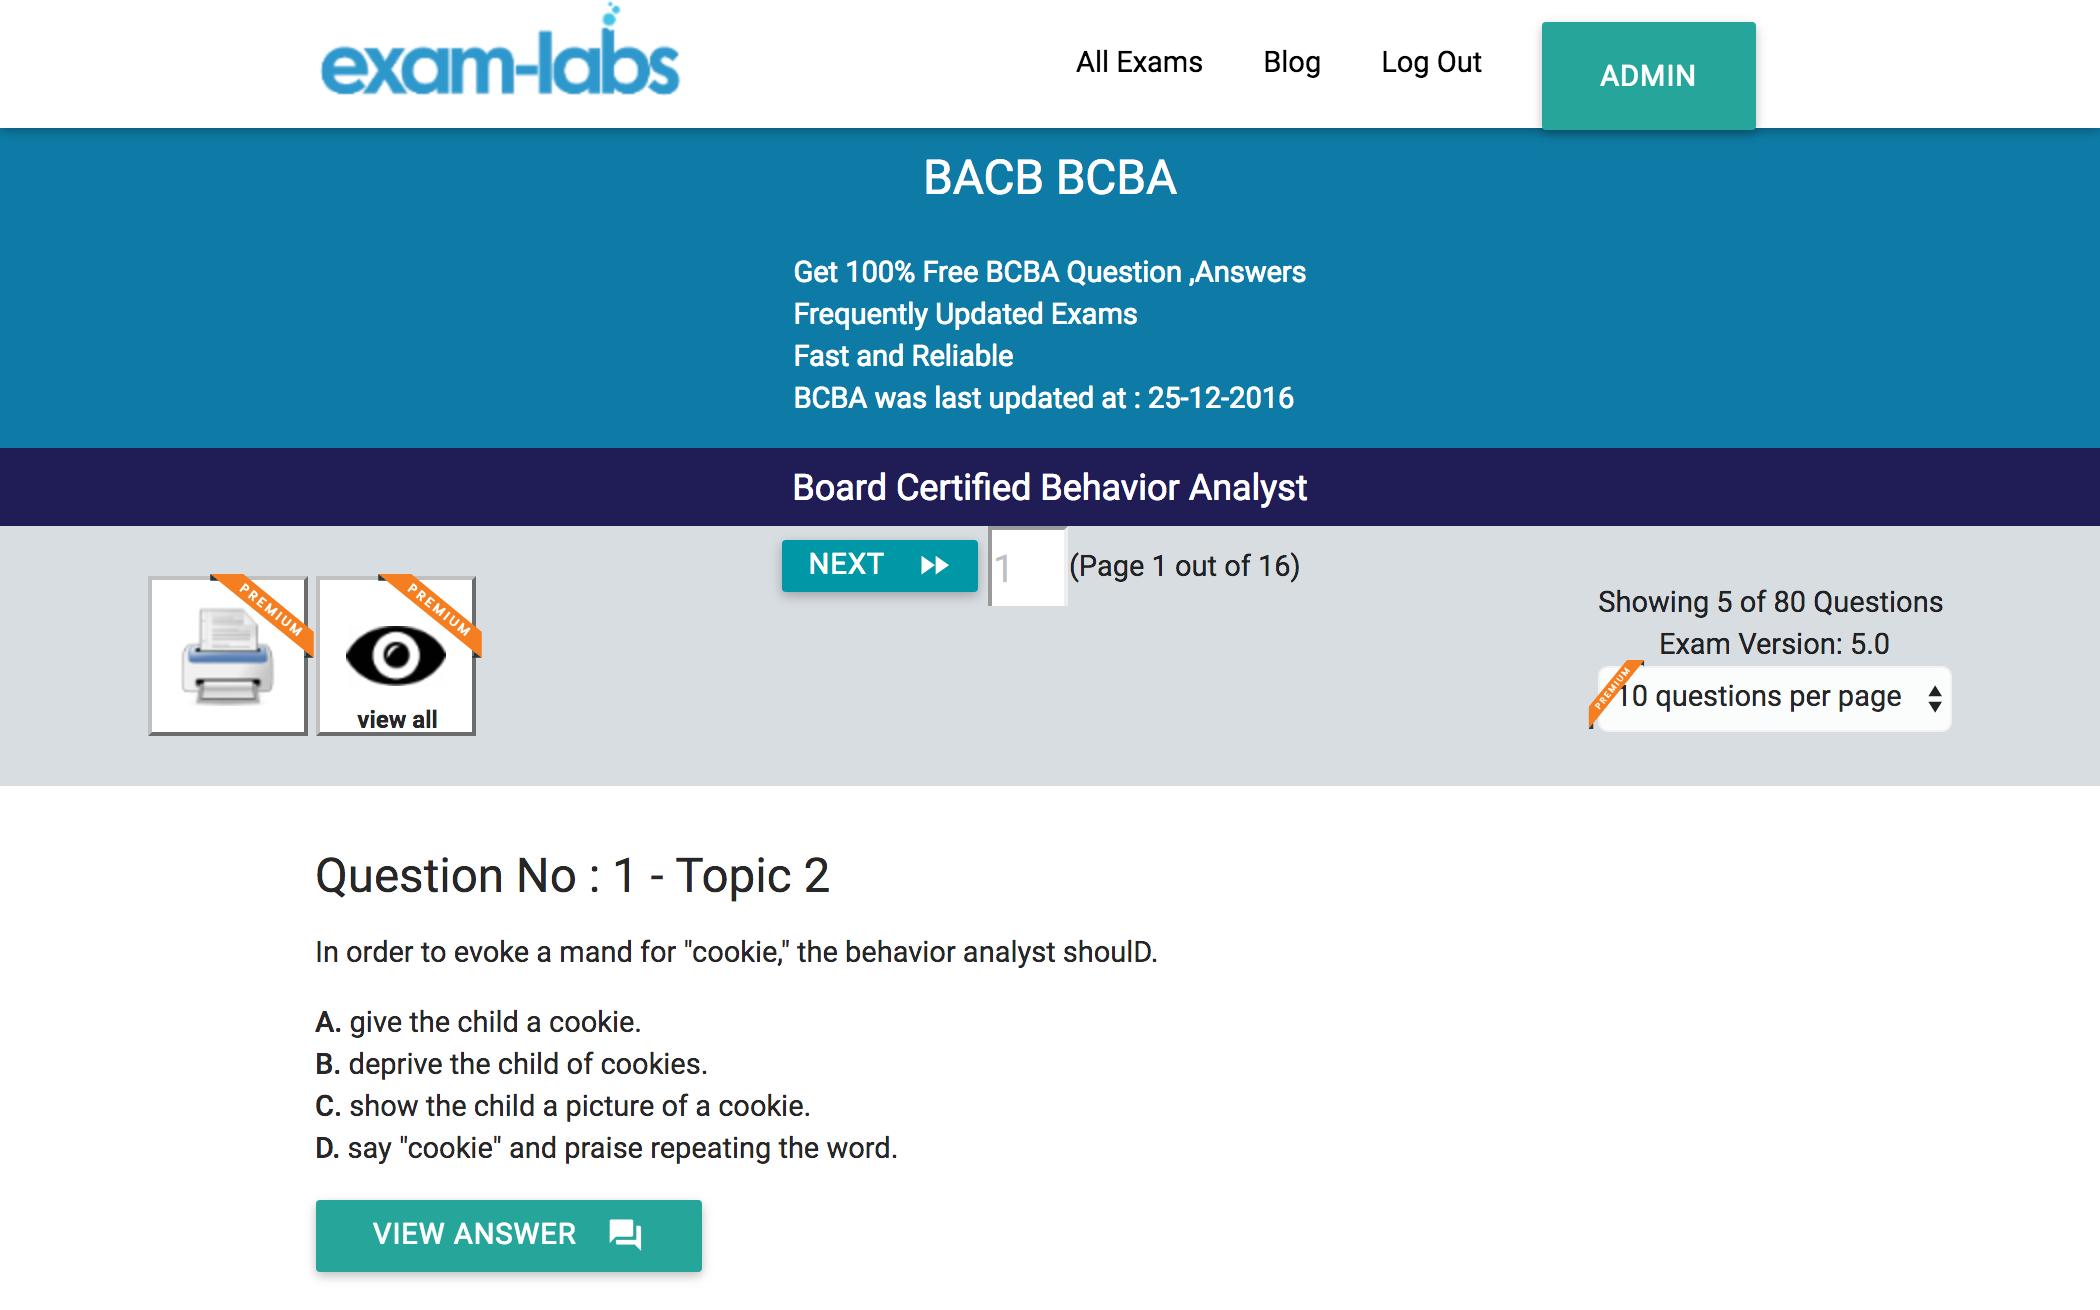 bcba bacb real exam questions % exam labs bacb bcba board certified behavior analyst exam